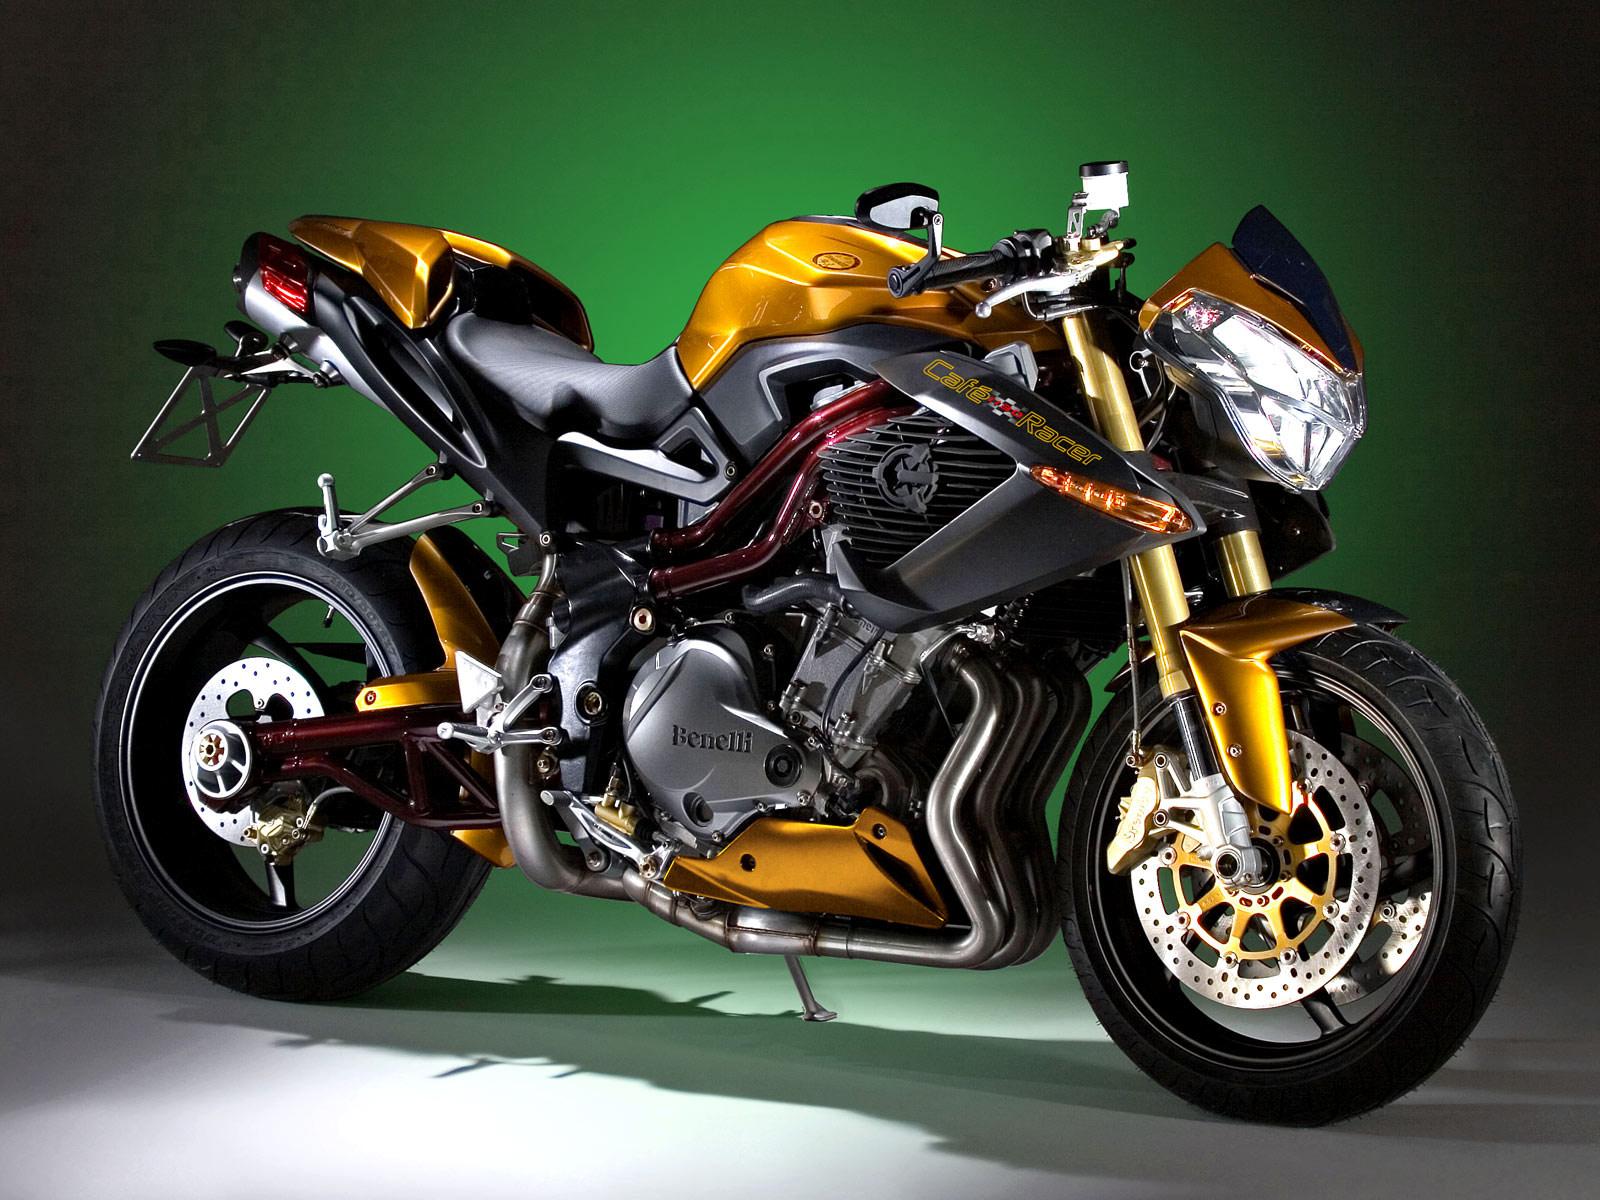 Motor Motor Modifikasi Motor Motor Modifikasi Motor Motor